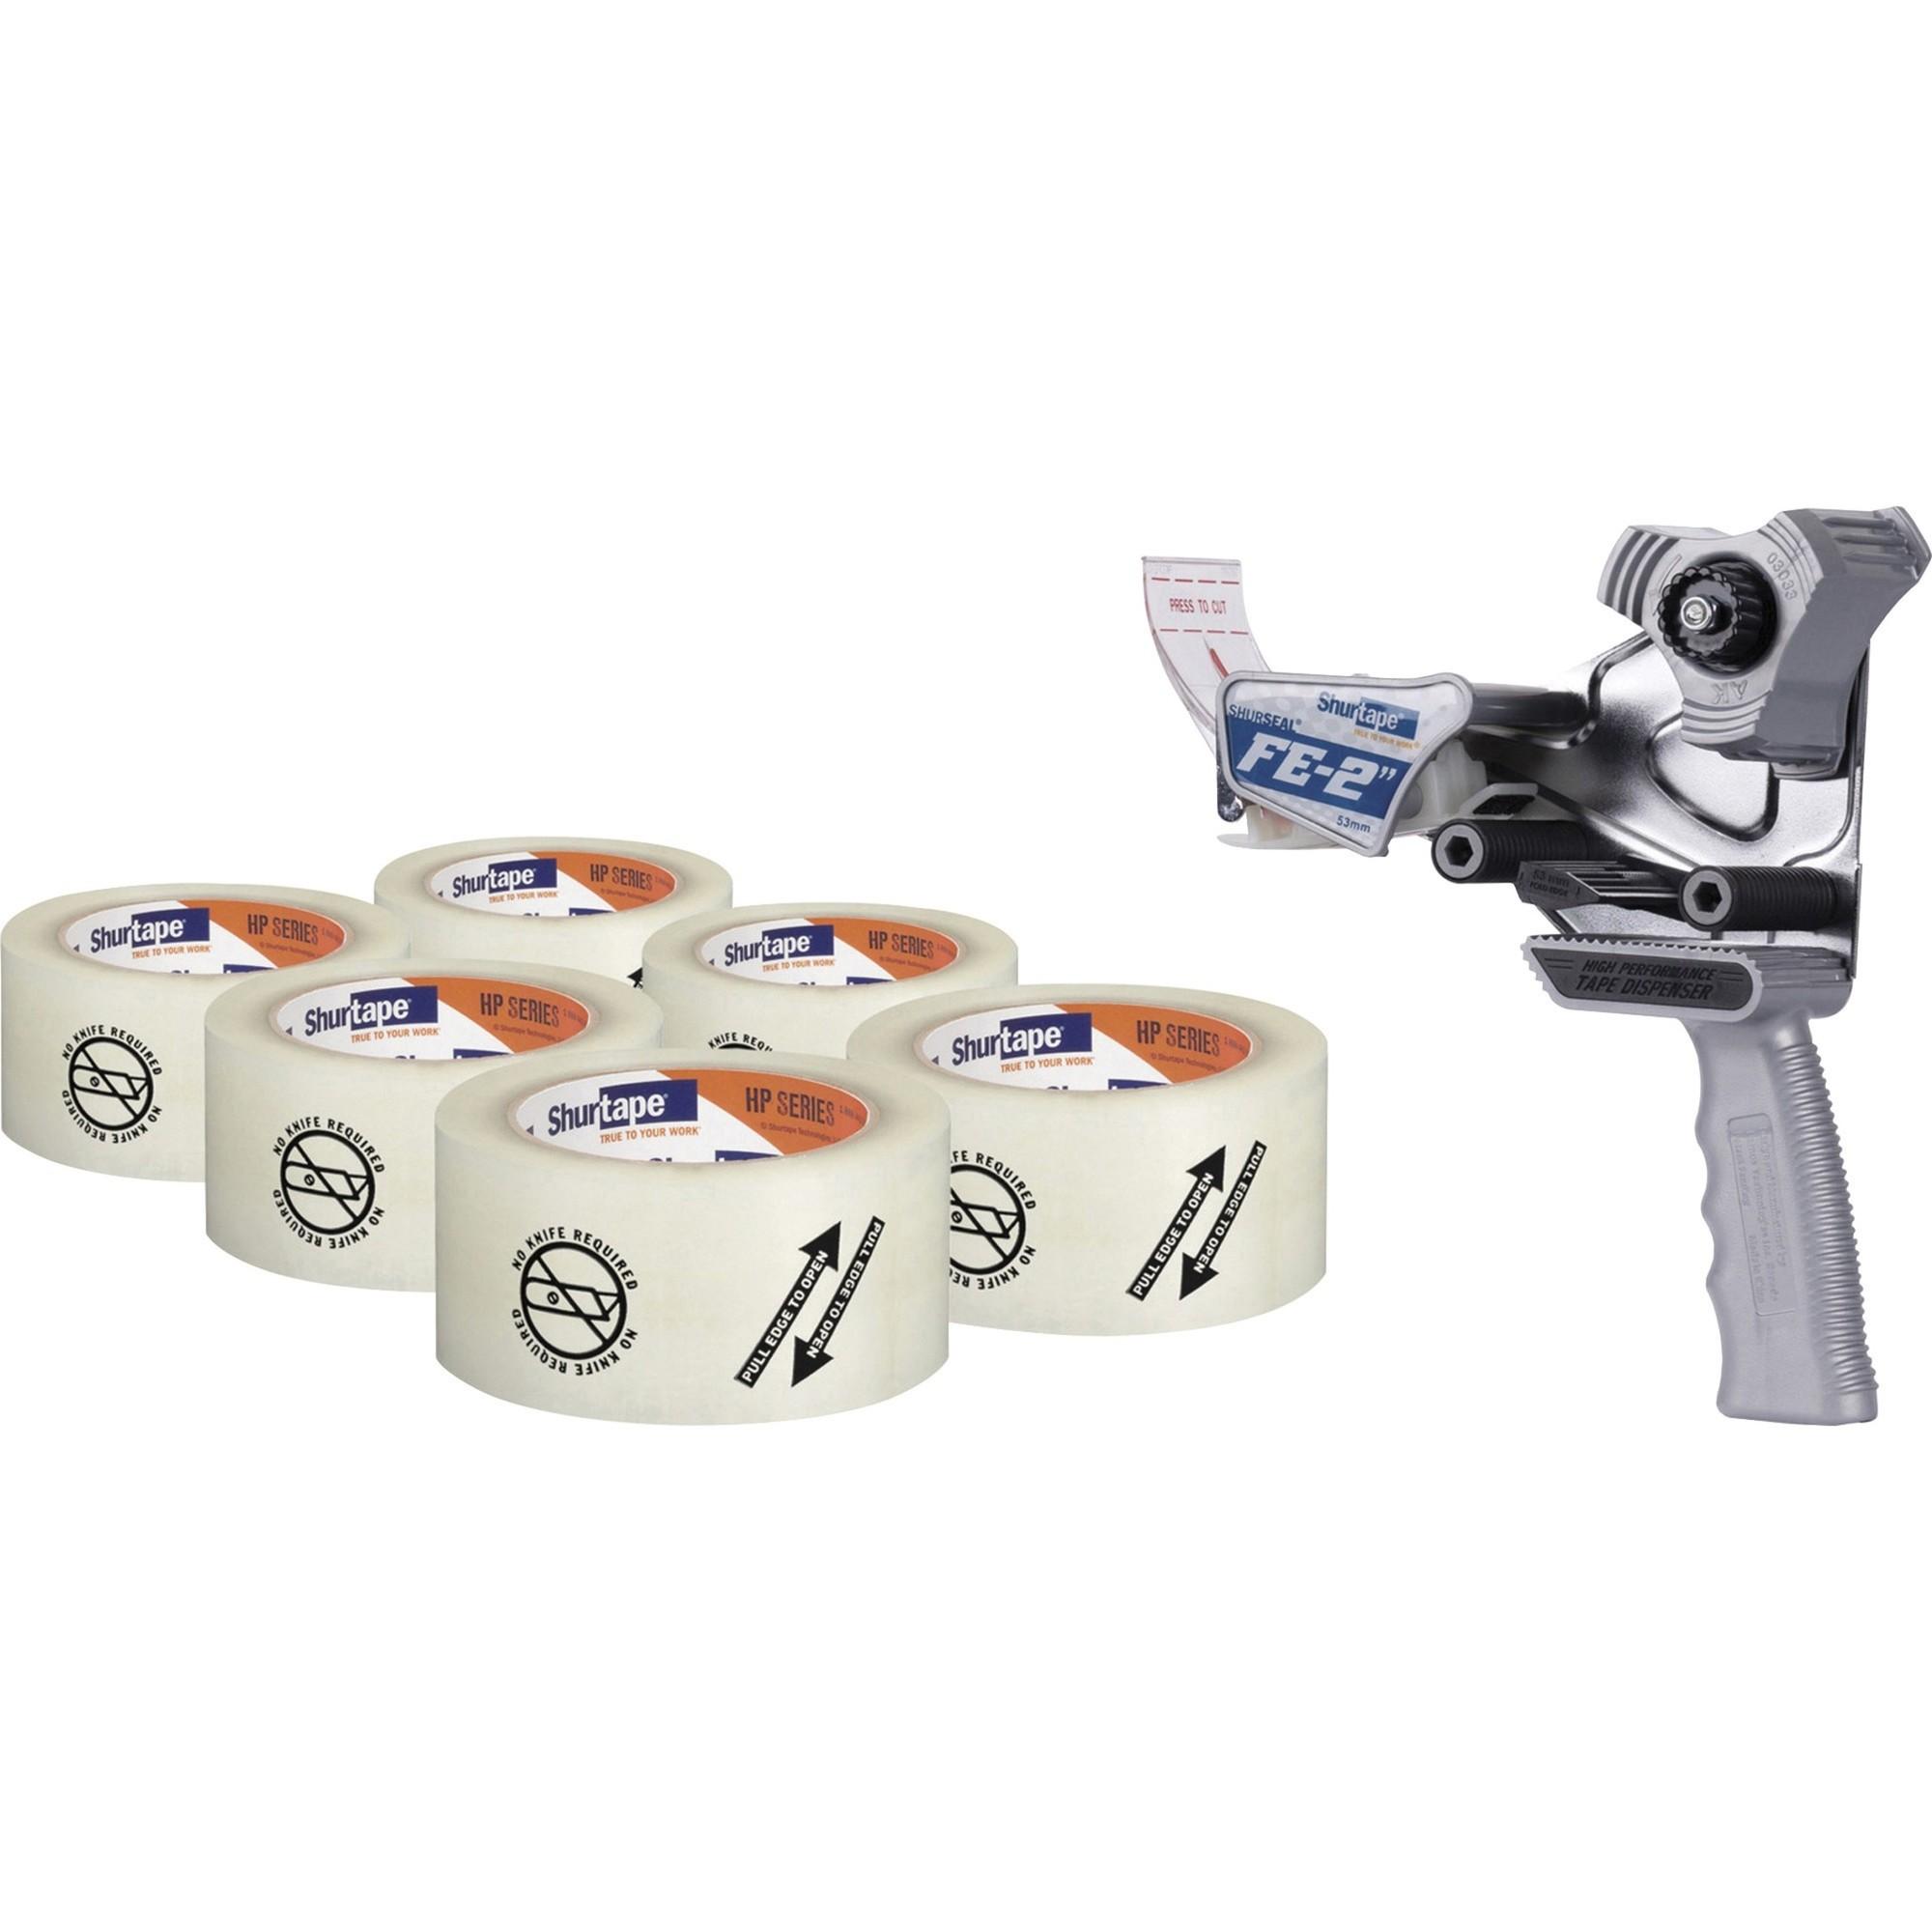 "Folded Edge Tape Dispenser with Folded Edge Tape, 3"" Core, Plus 6 Rolls of 2.08"" x 110 yds Tape, Plastic/Steel, Gray"